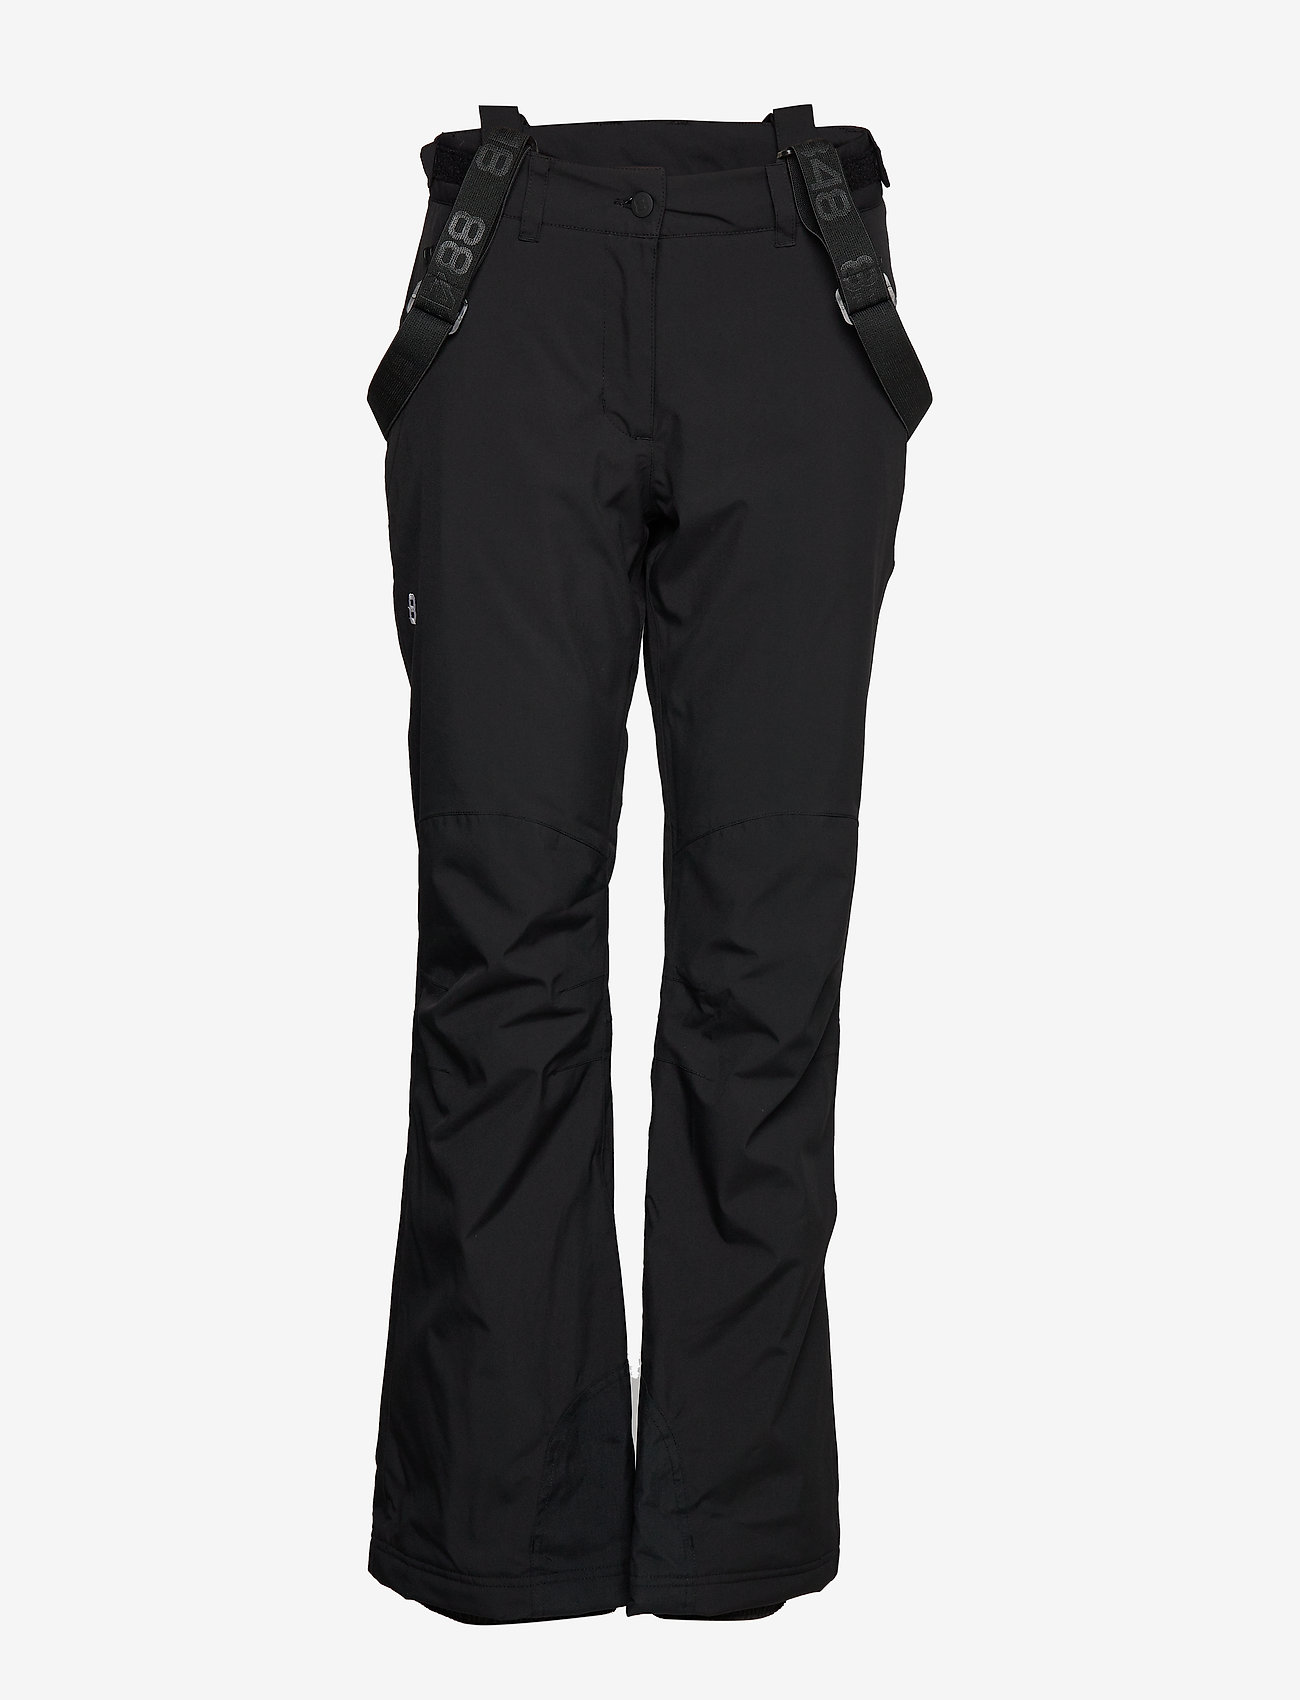 8848 Altitude - Ewe W Pant - softshell pants - black - 0